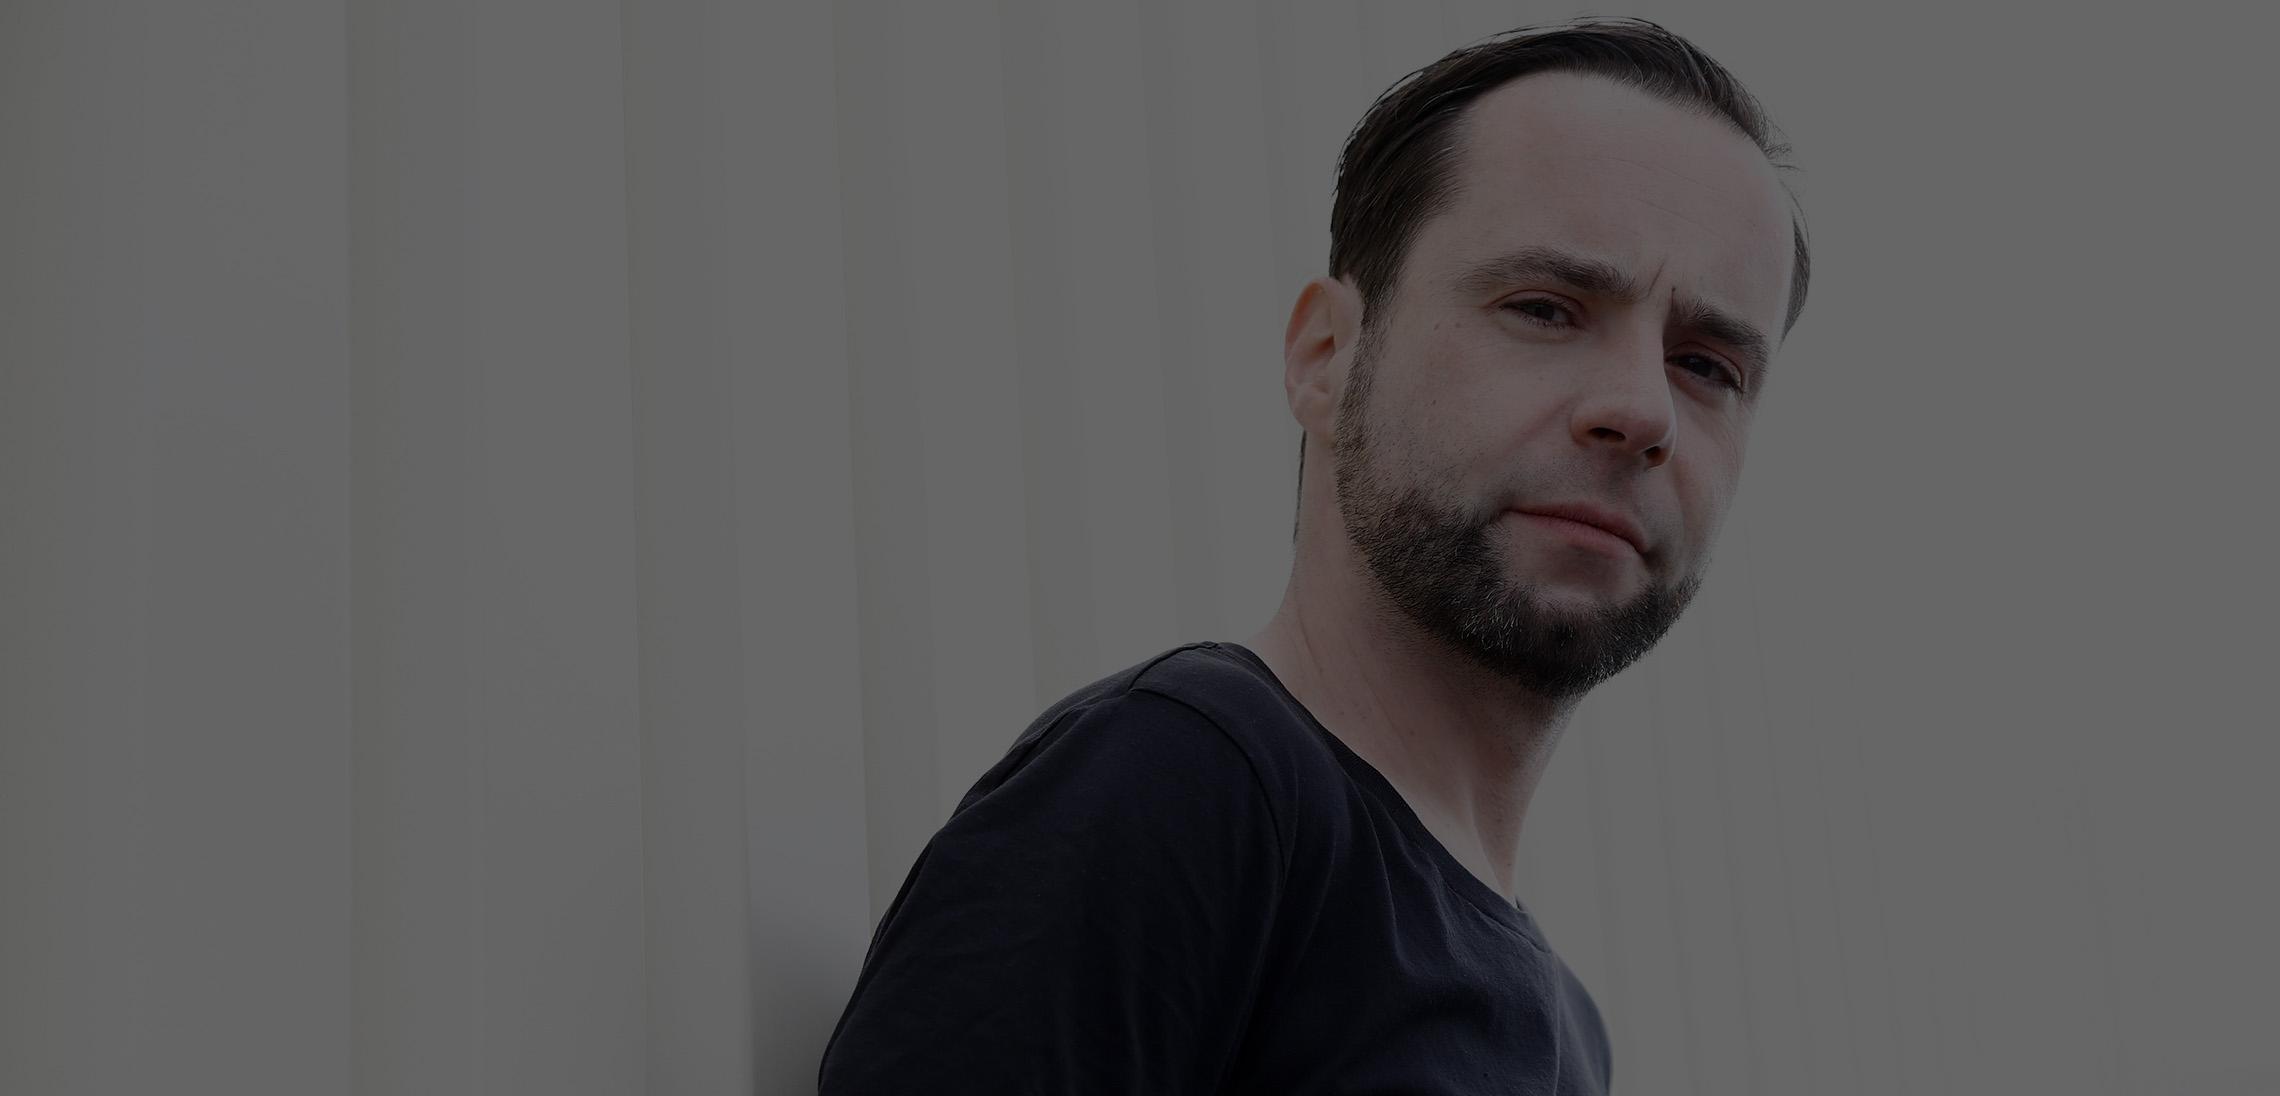 Daniel Steinberg - Crazy Life EP hero